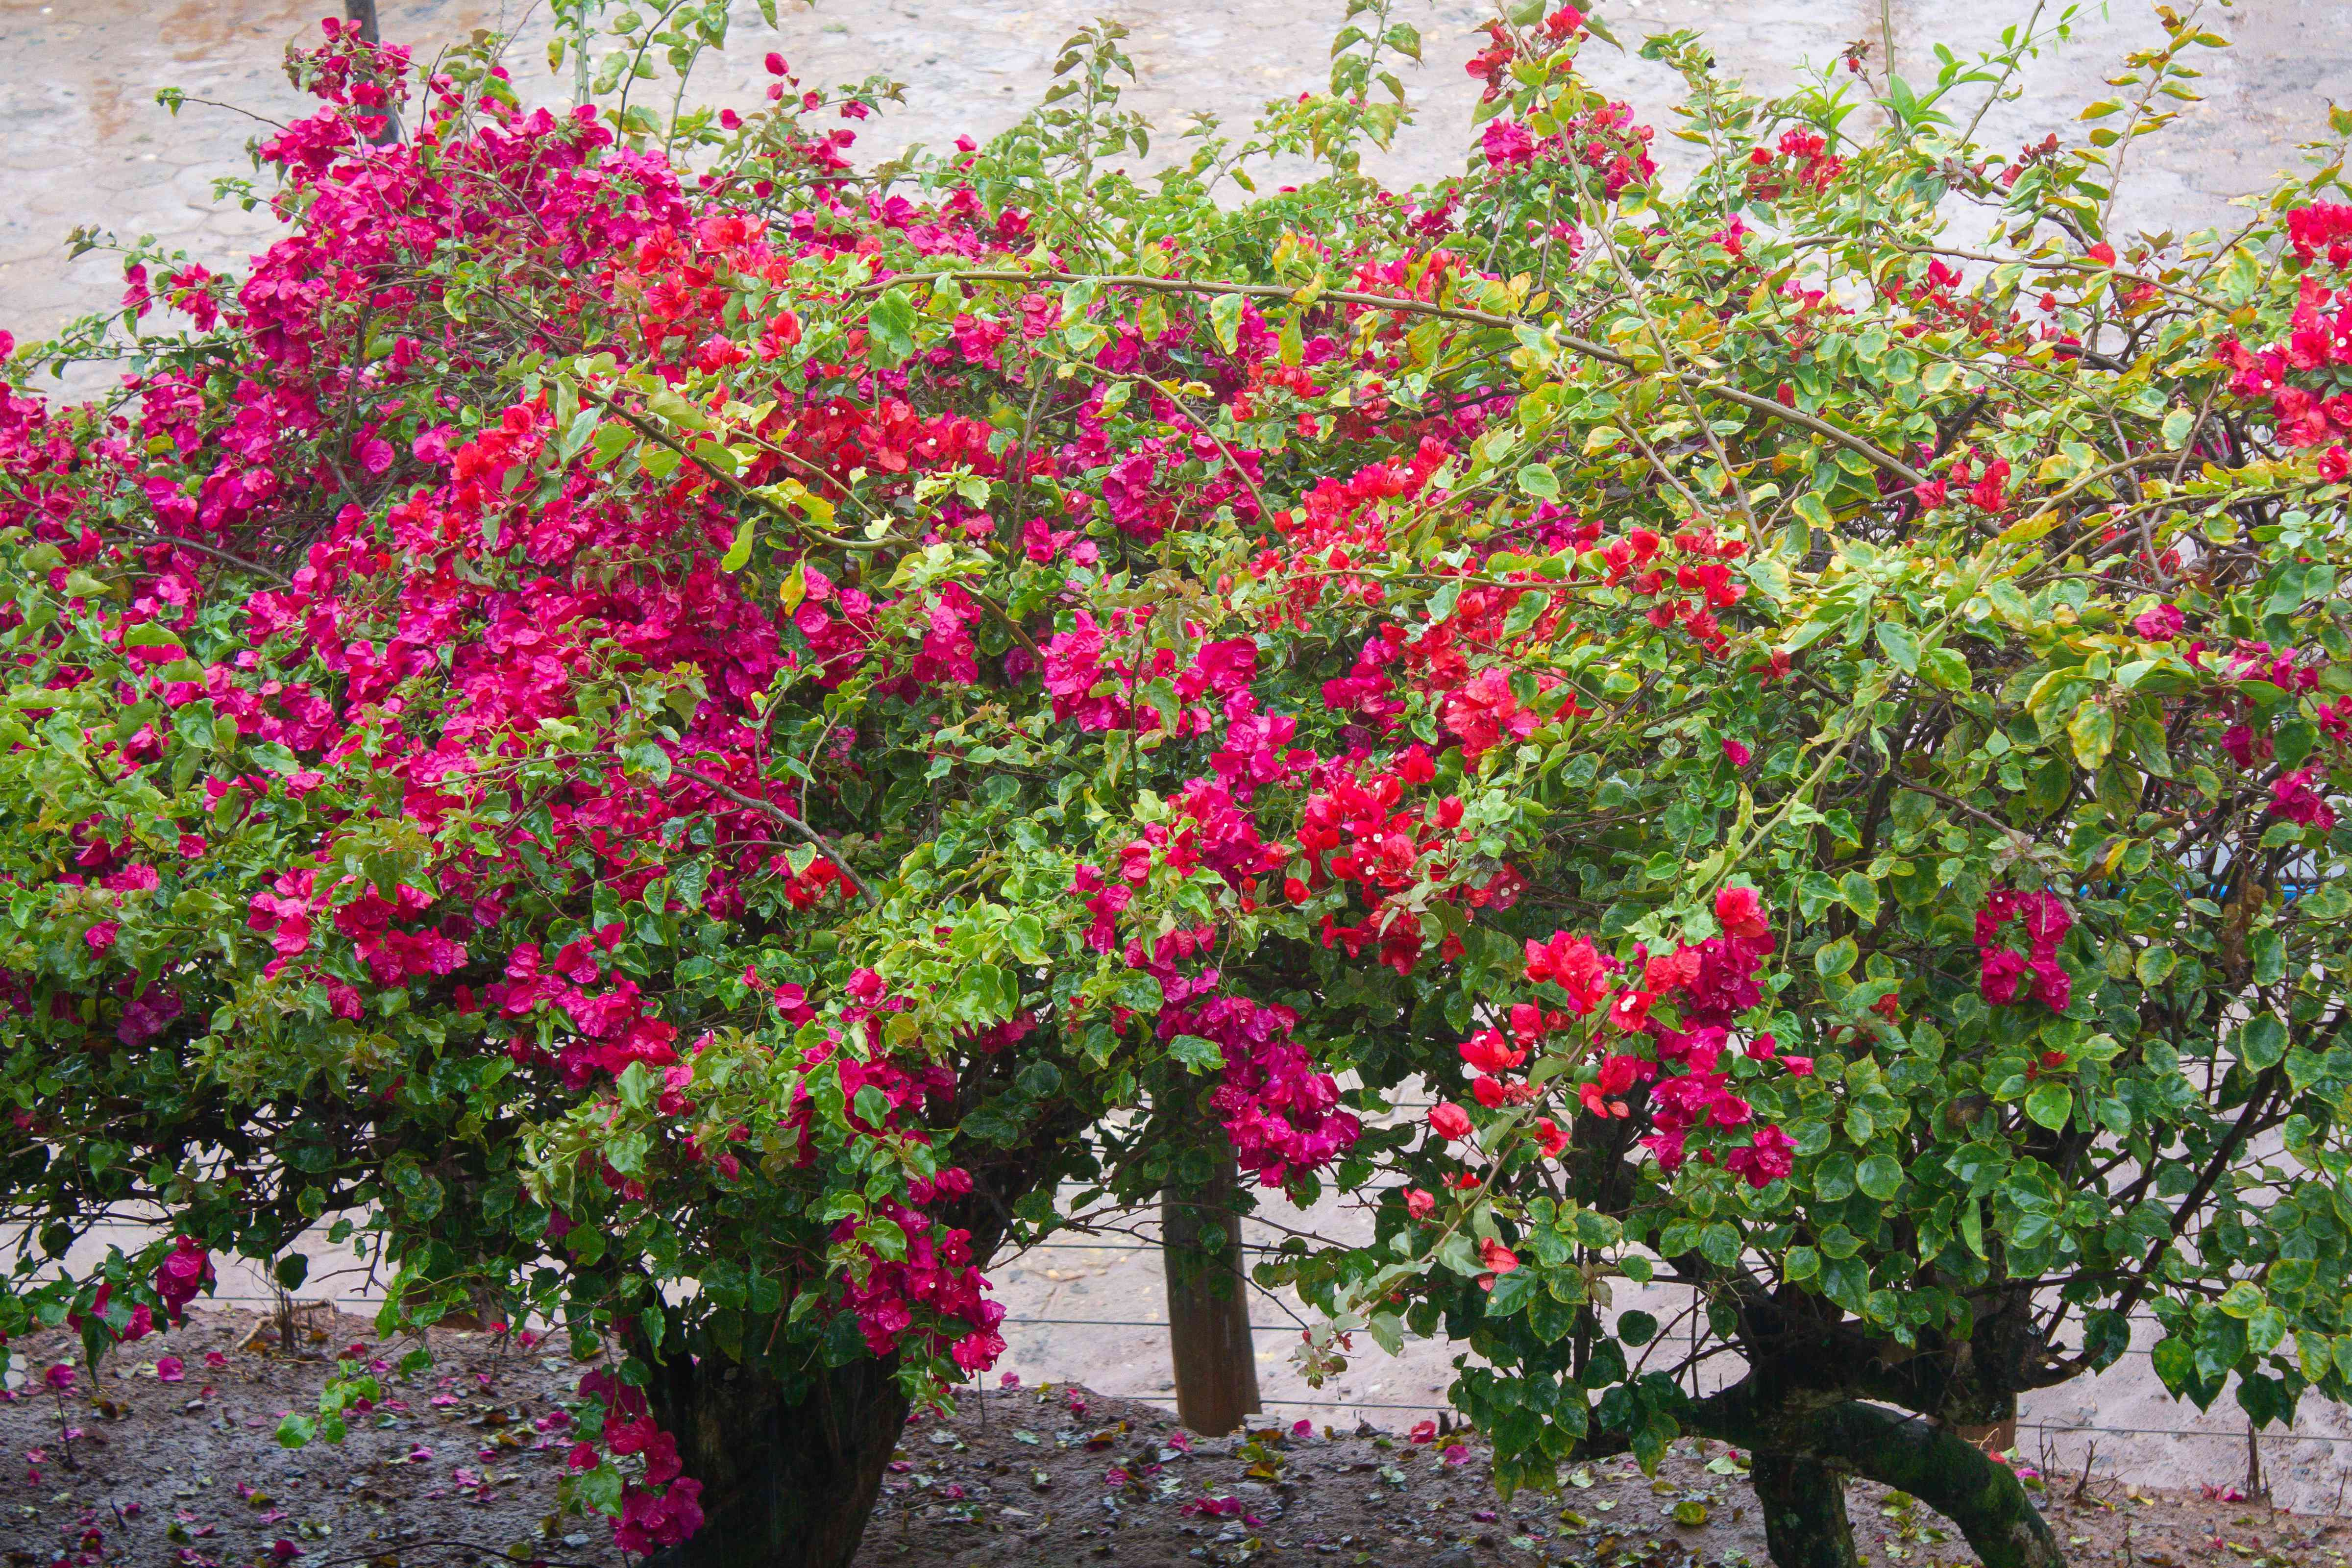 bougainvillea shrubs